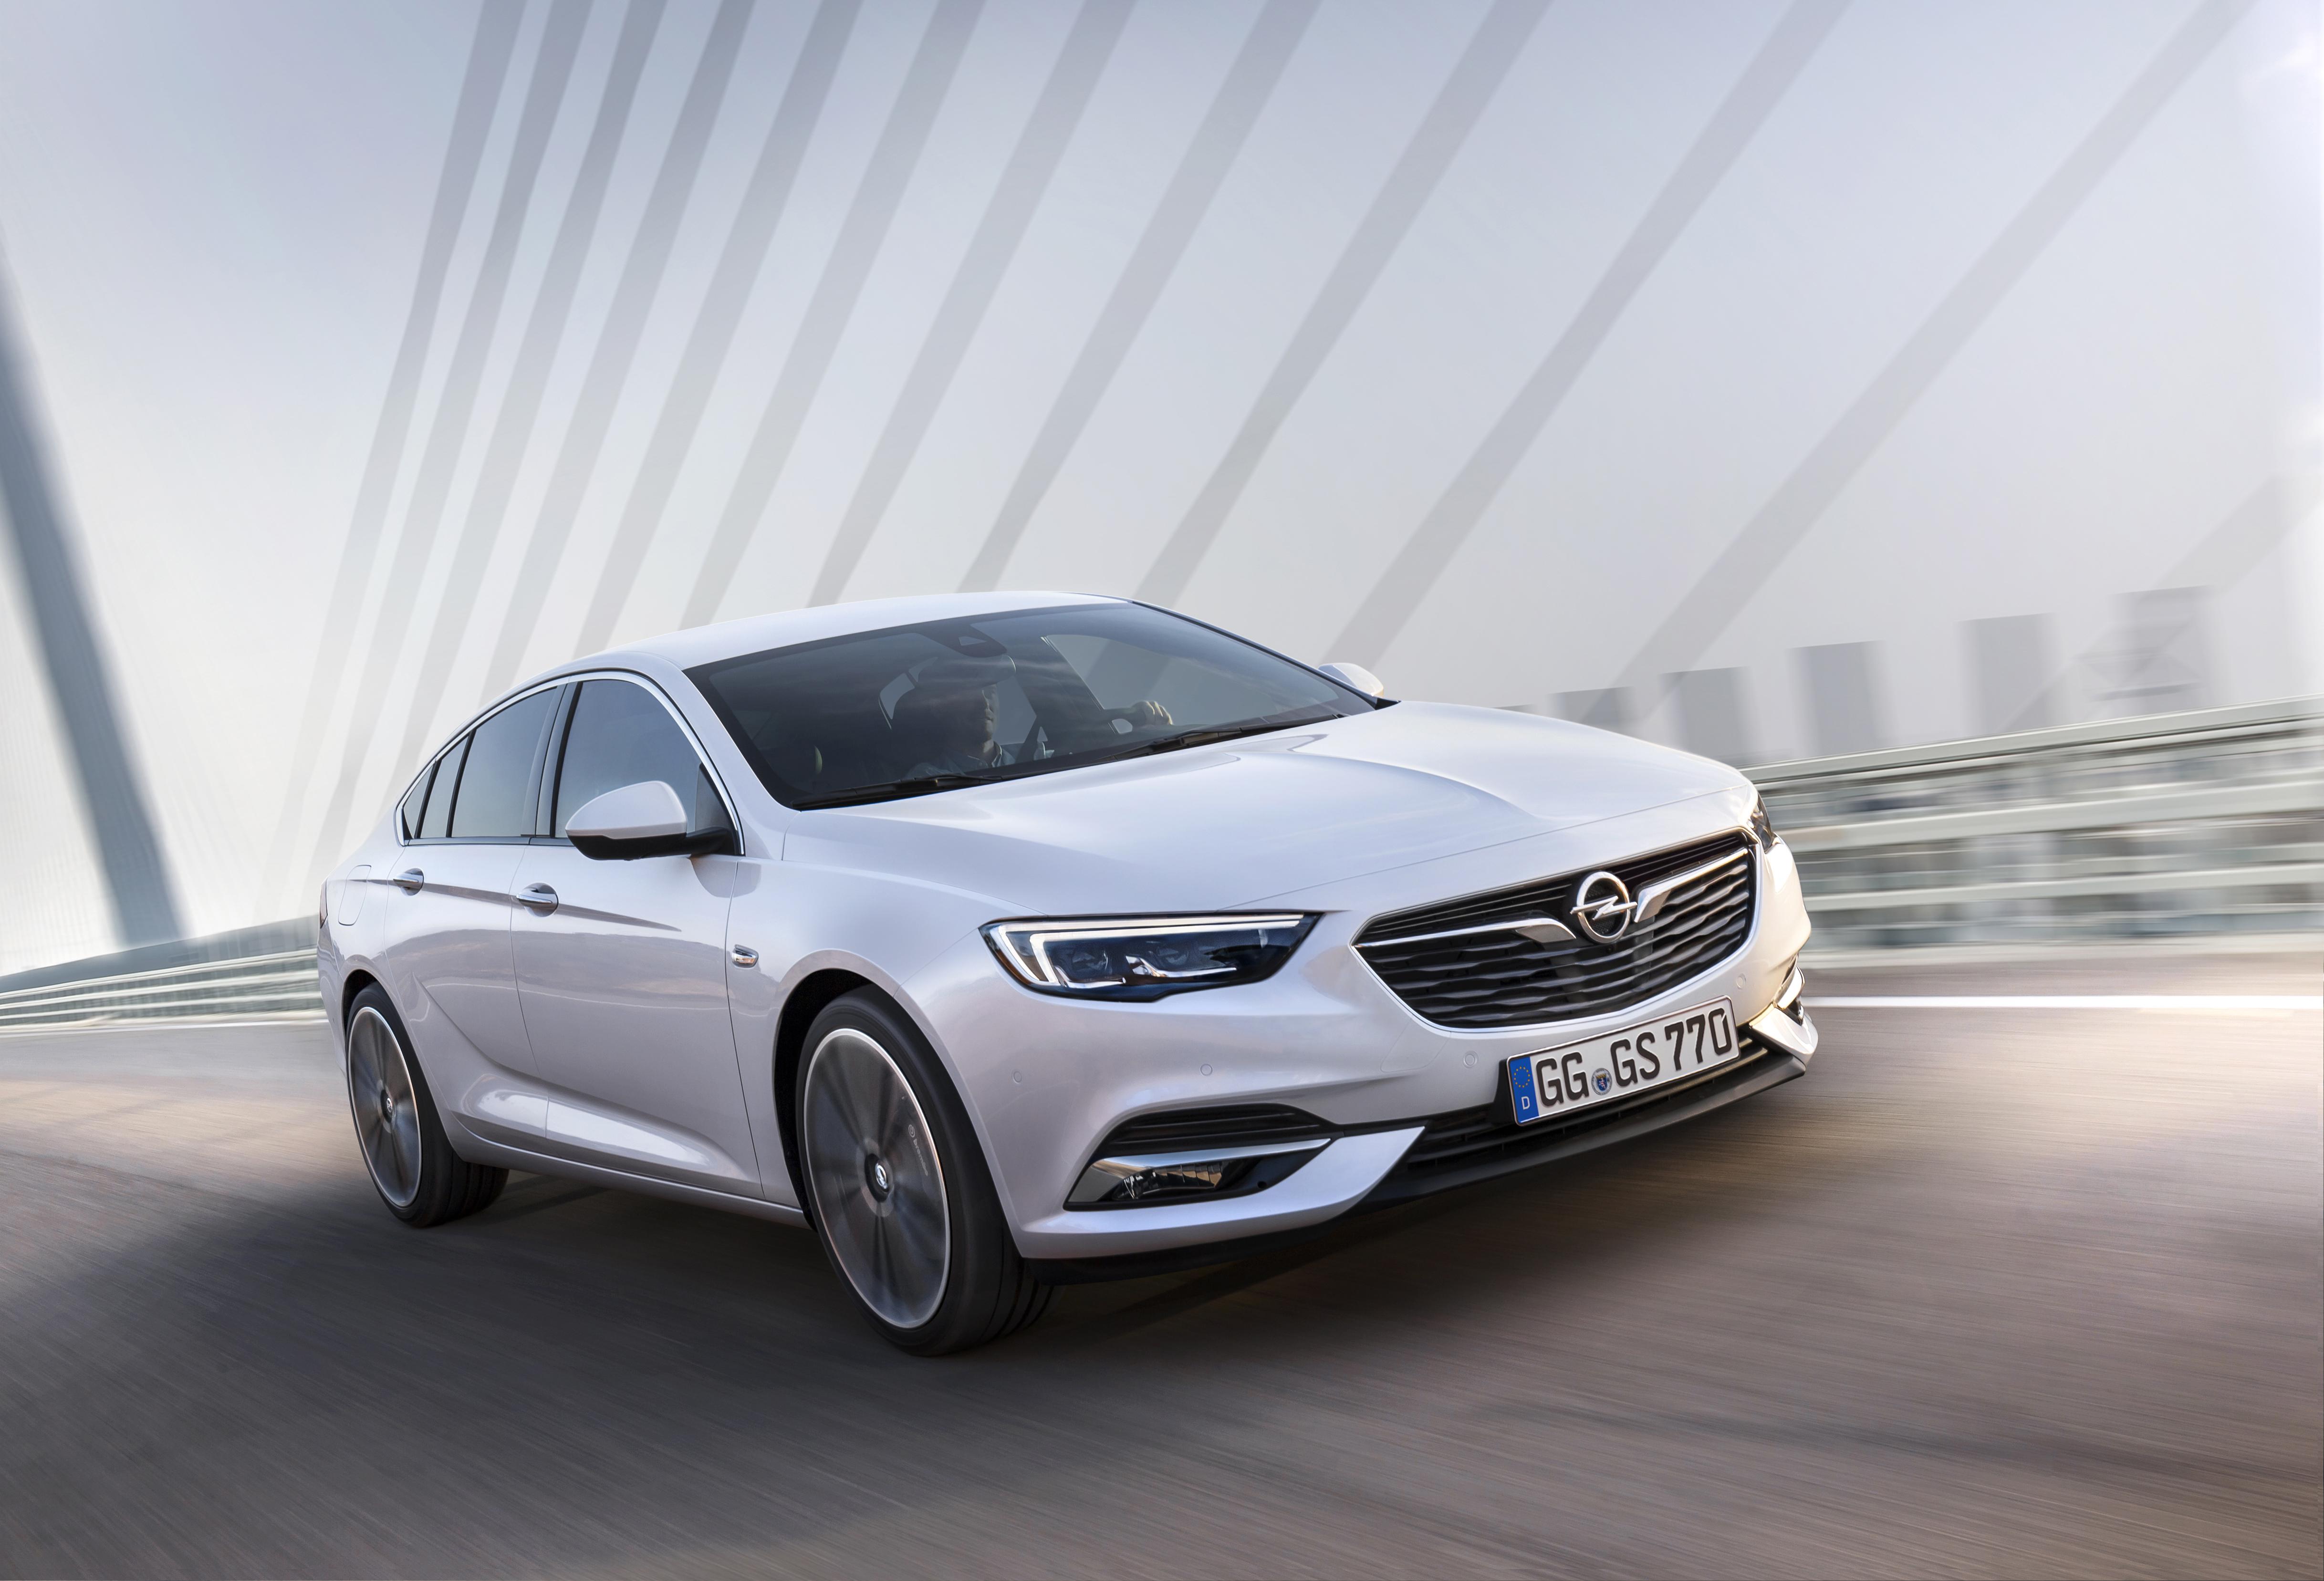 A white 2018 Opel Insignia sedan on the road.